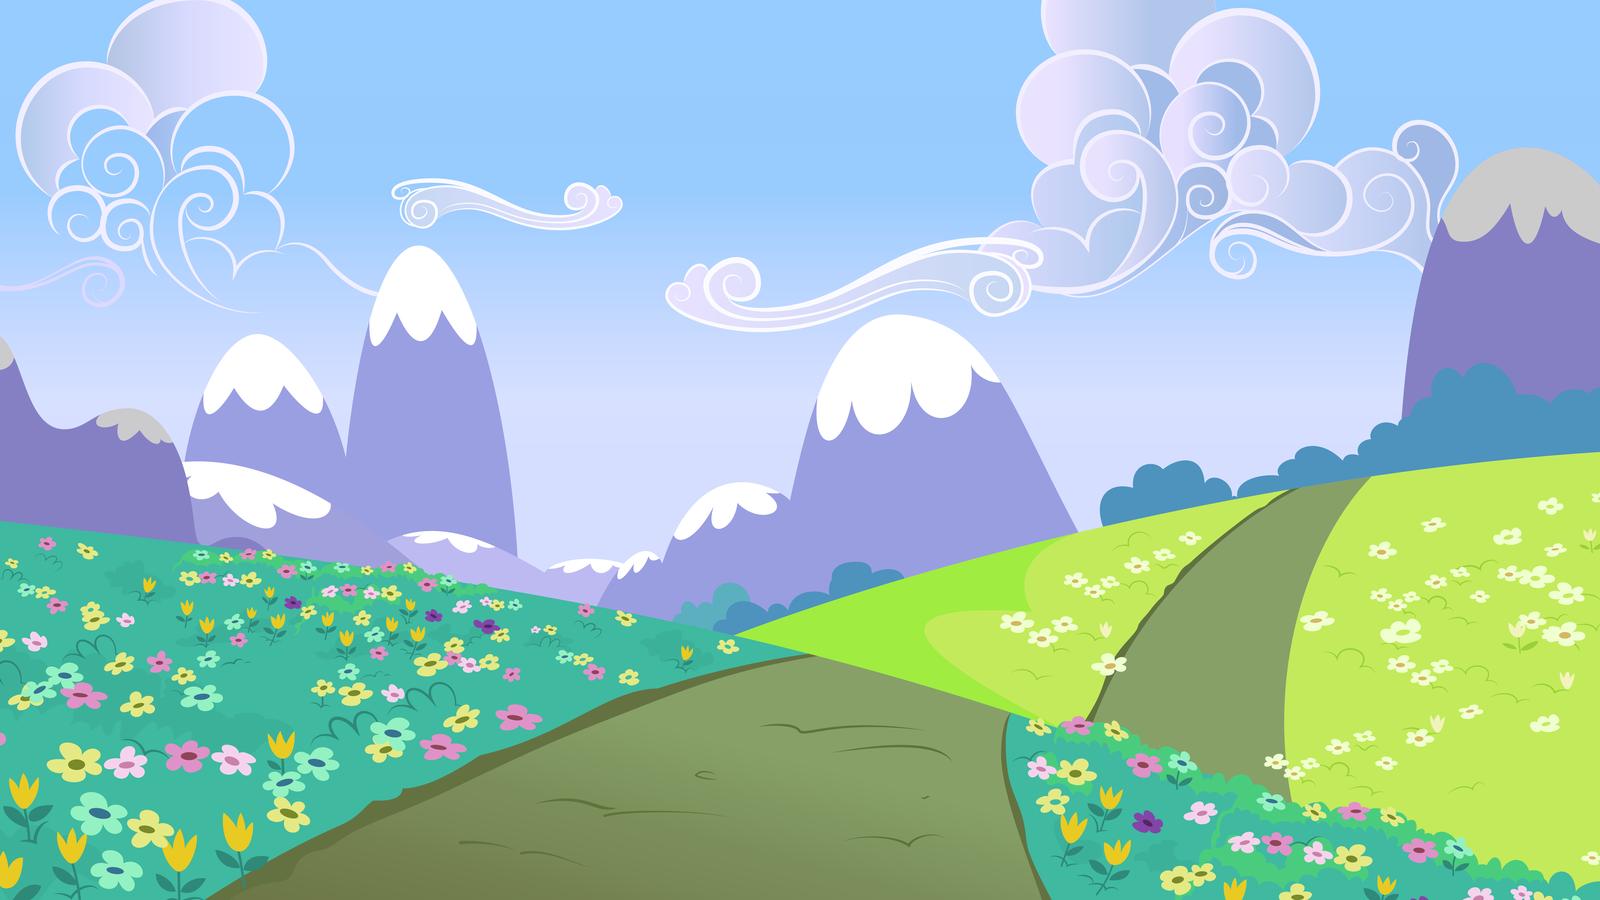 Drawn hill rolling hills Crystal Resources DeviantArt Path Hills